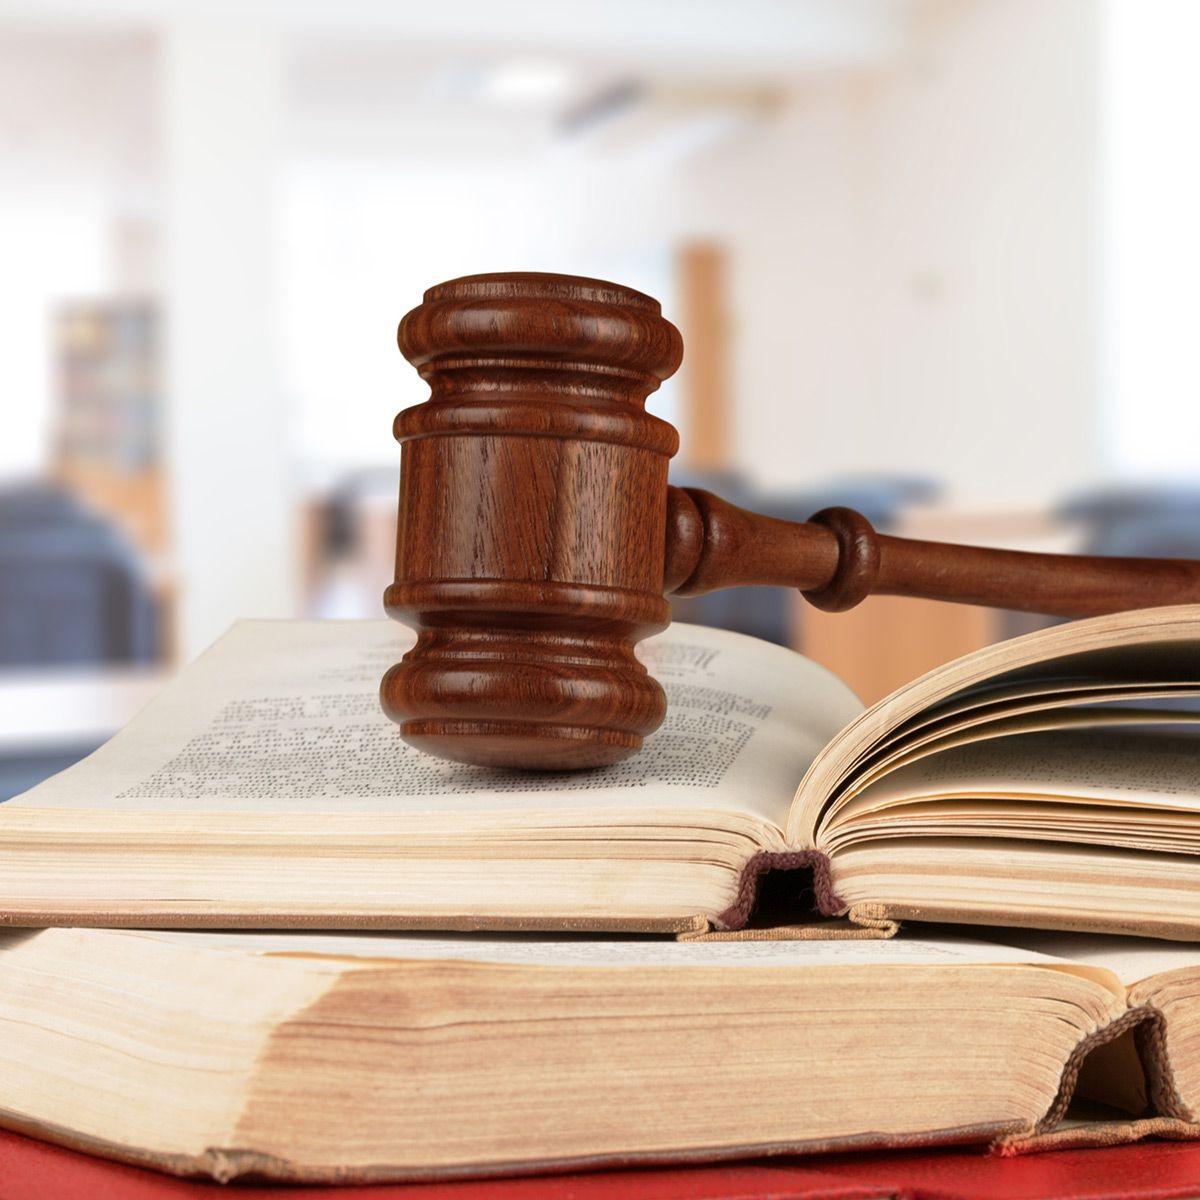 Direito de Propriedade Intelectual  - PUC Minas